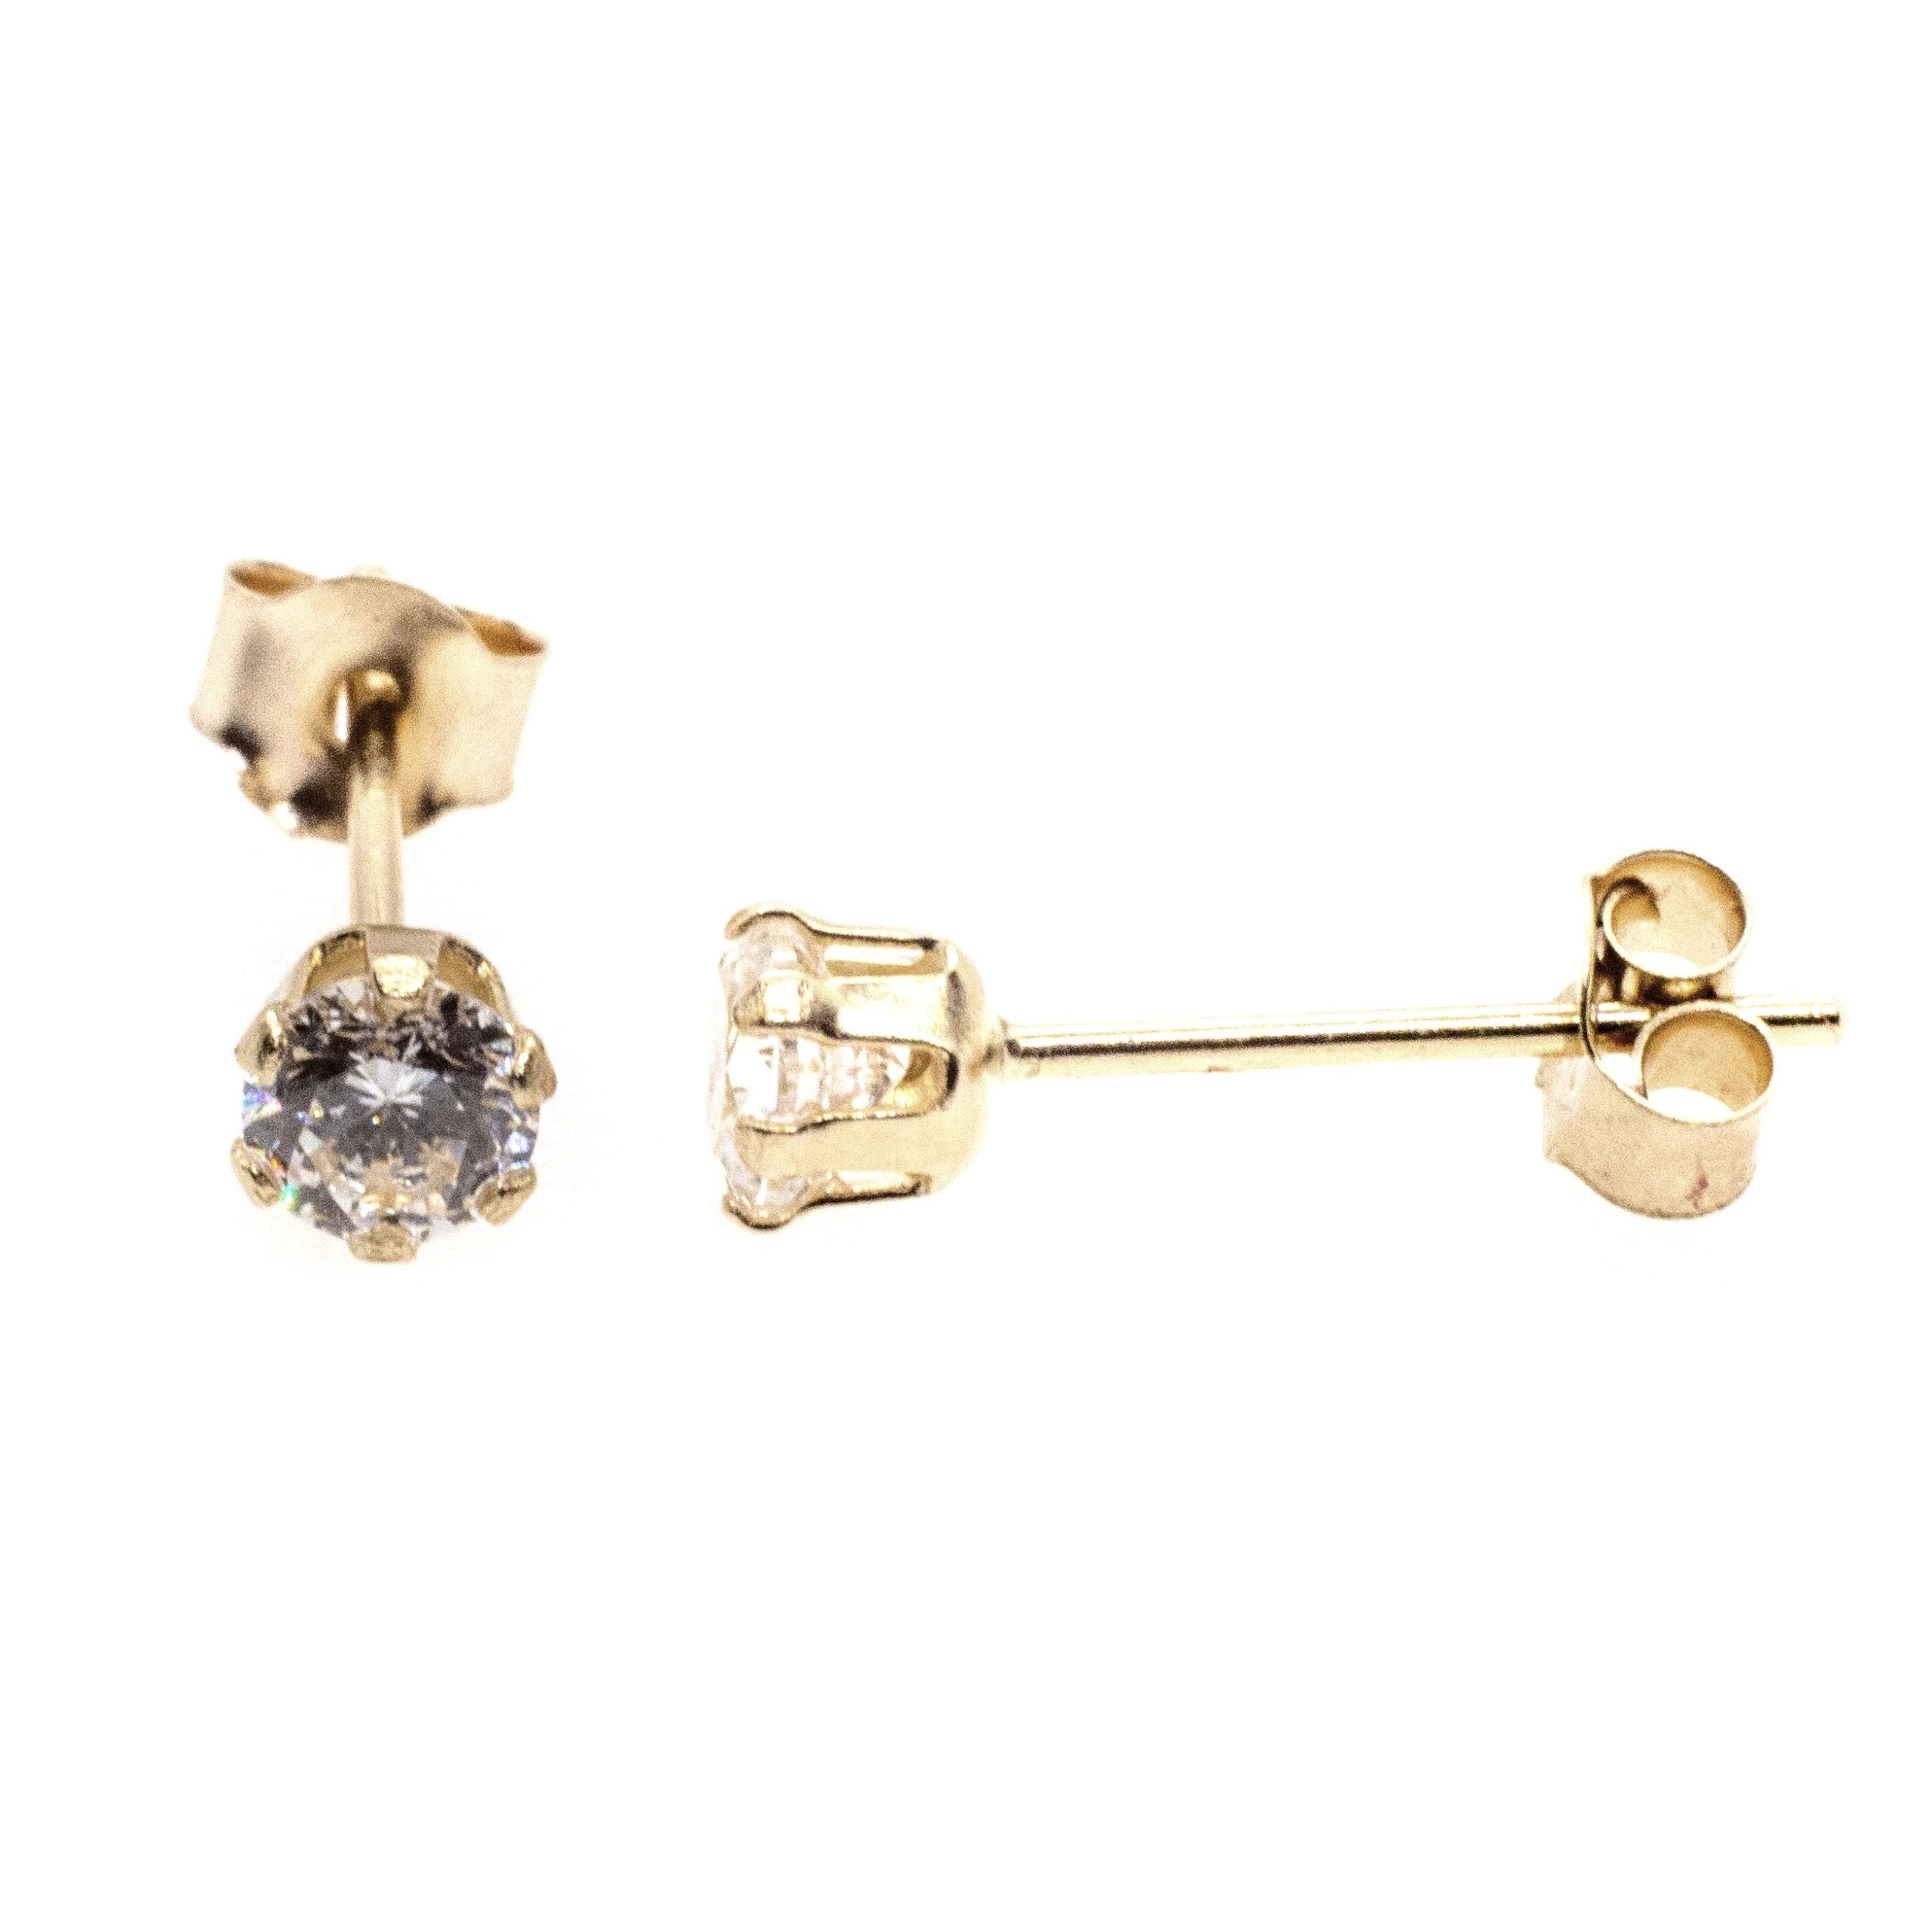 4mm CZ stud earrings 9ct yellow gold alt 4